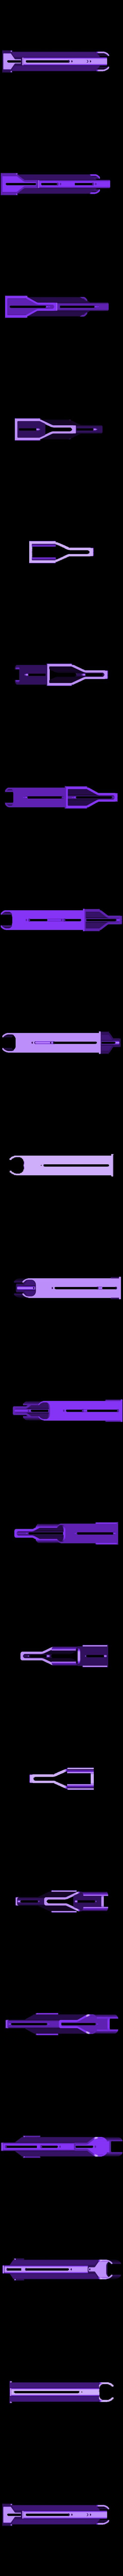 MAG_BODY_X.stl Download free STL file Zombie Slayer (5 SHOT MAG) • 3D printer template, MuSSy